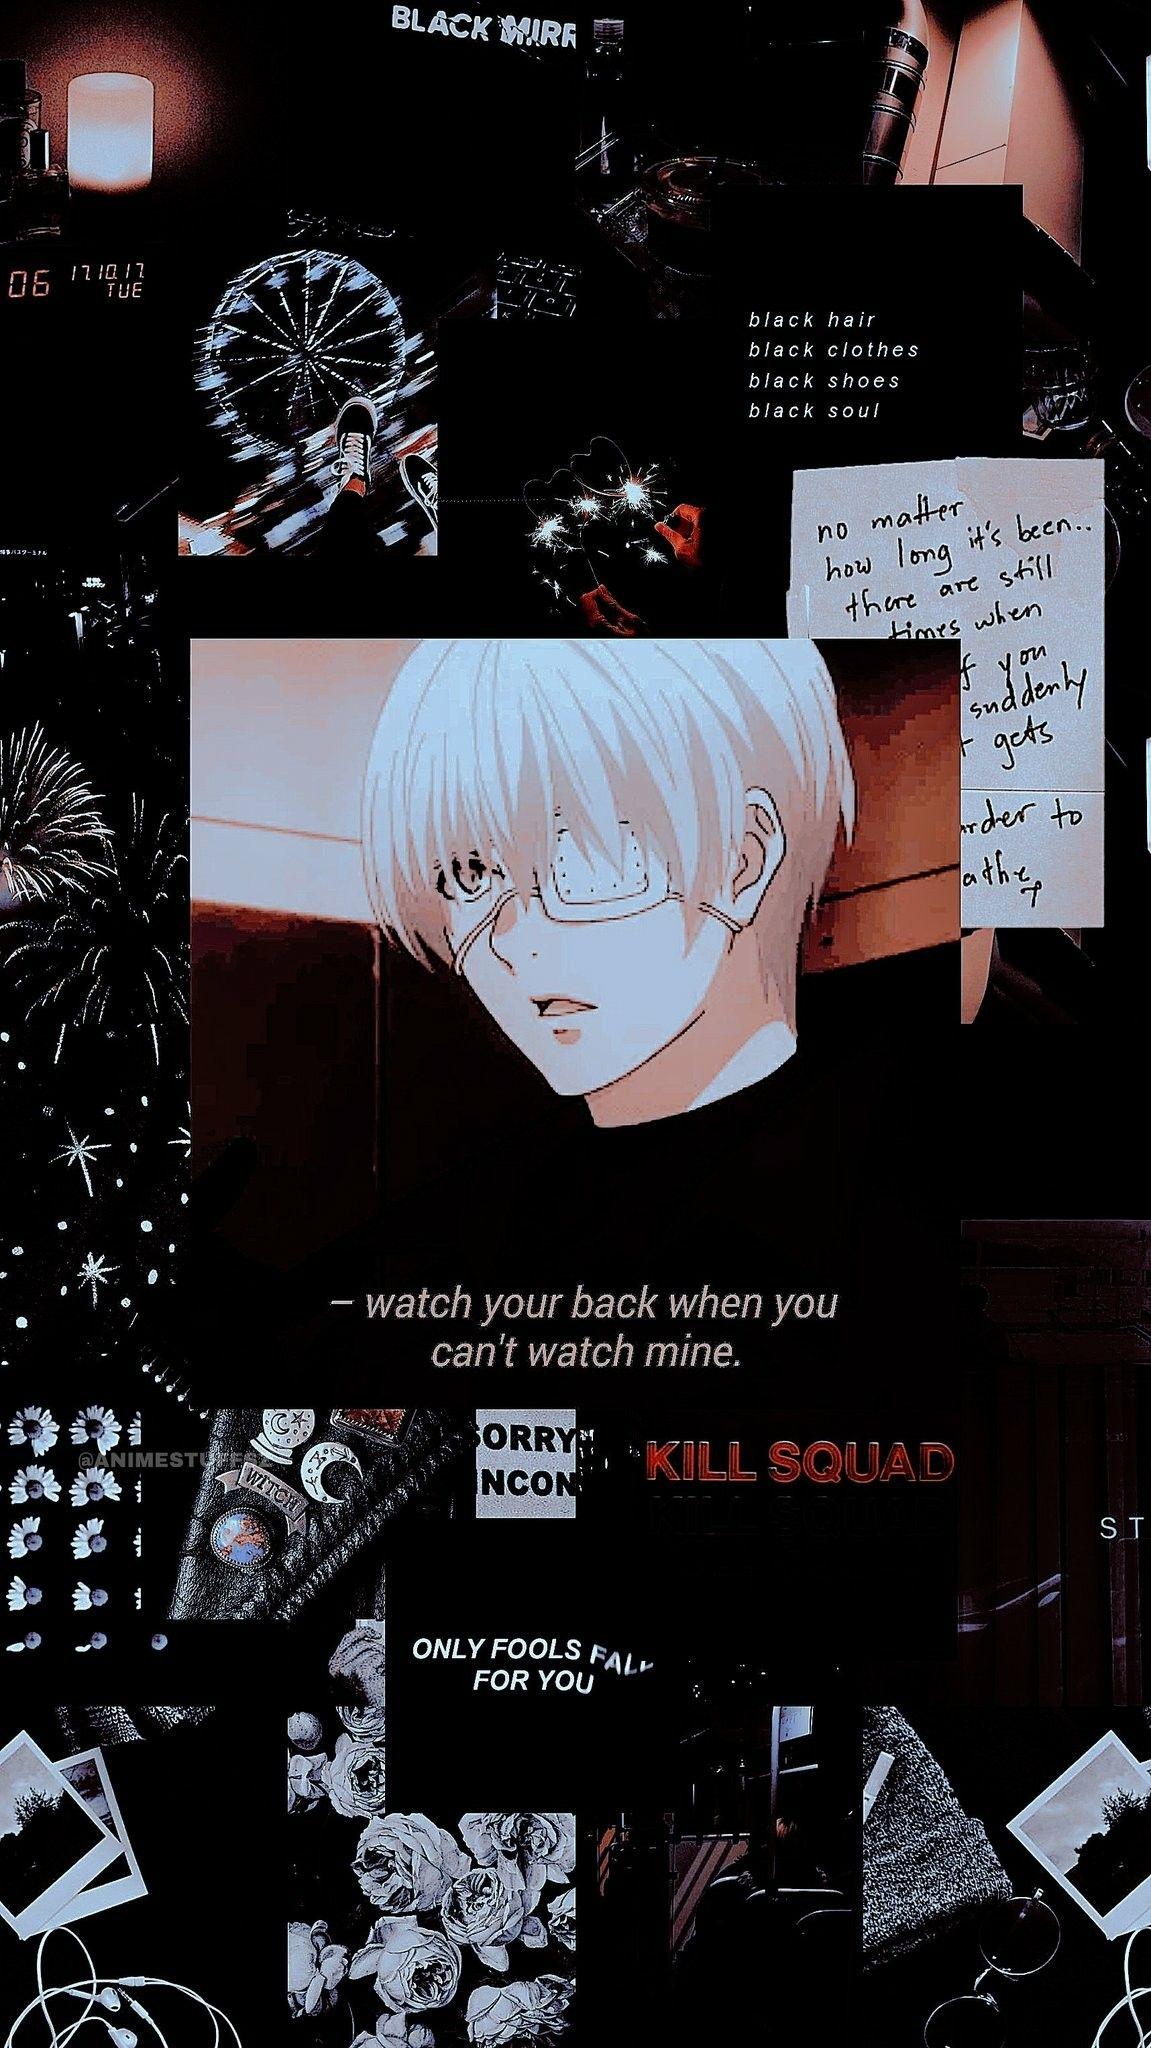 ᴘɪɴ ʜʏs104 ʙɴᴇʟʏ Cute Anime Wallpaper Tokyo Ghoul